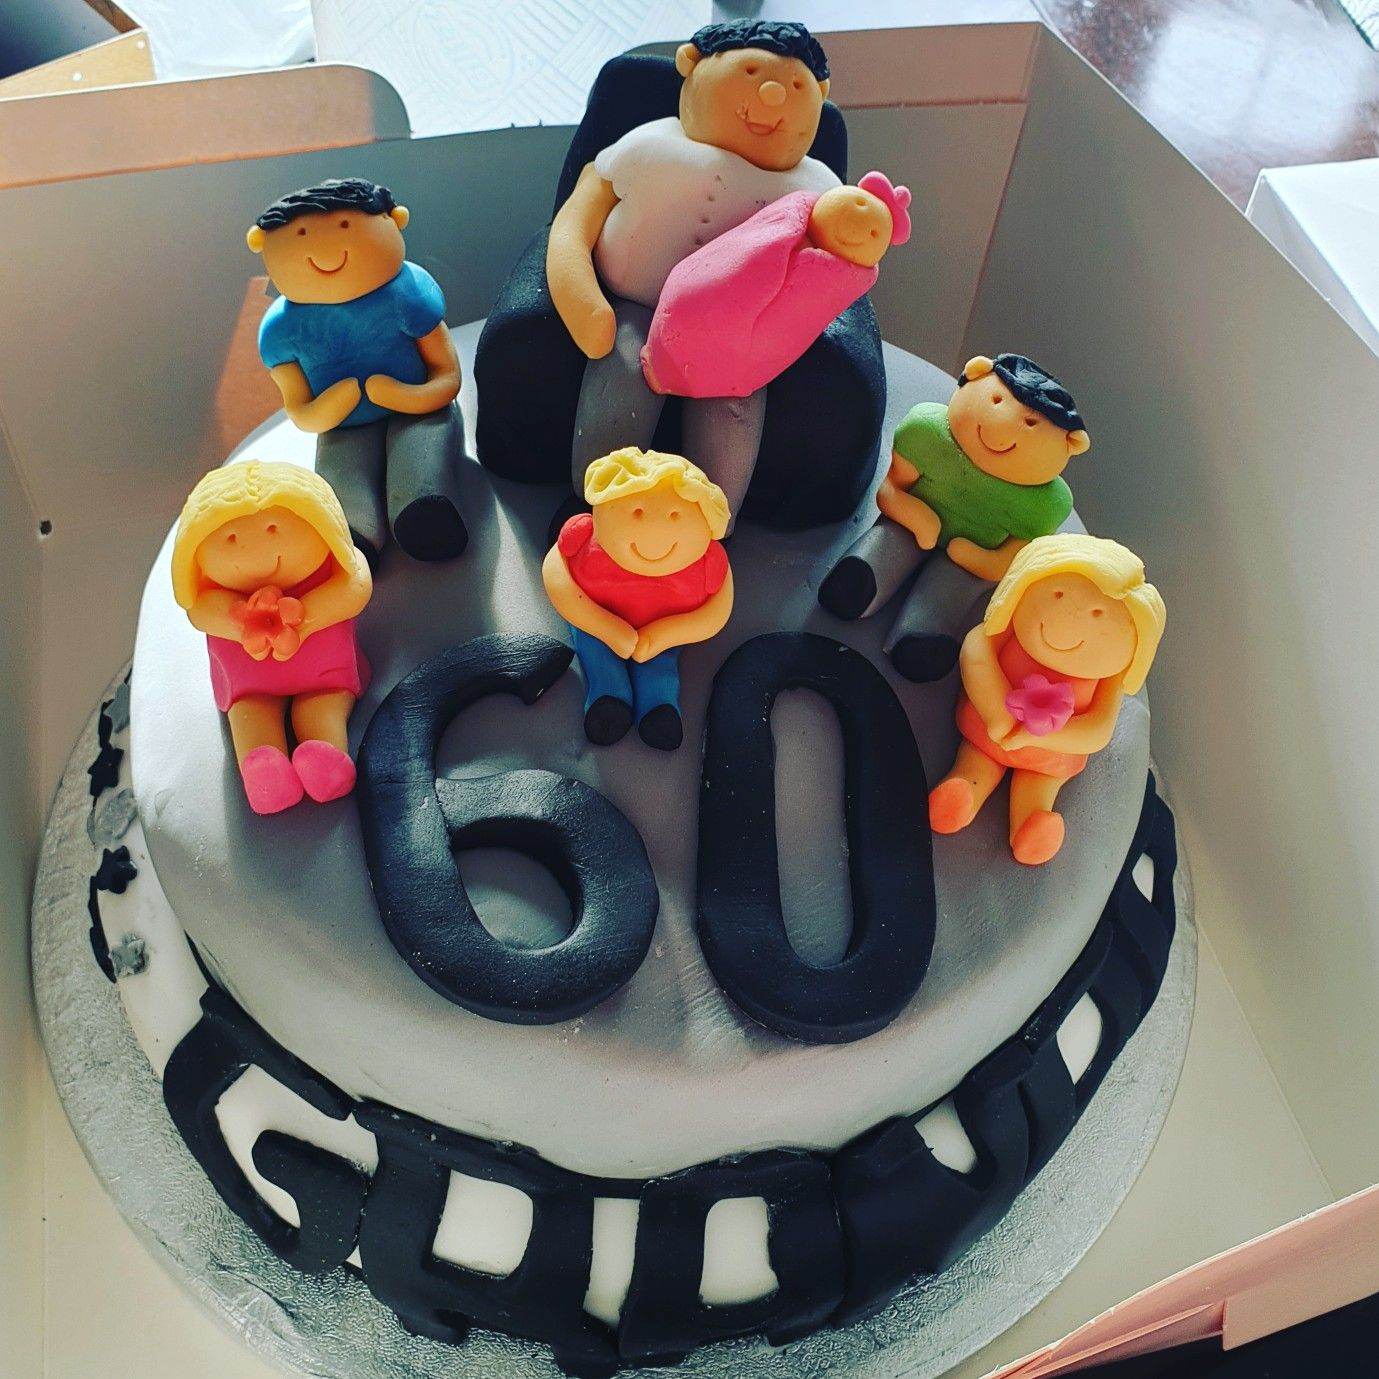 47+ Birthday cake for grandma and grandpa inspirations